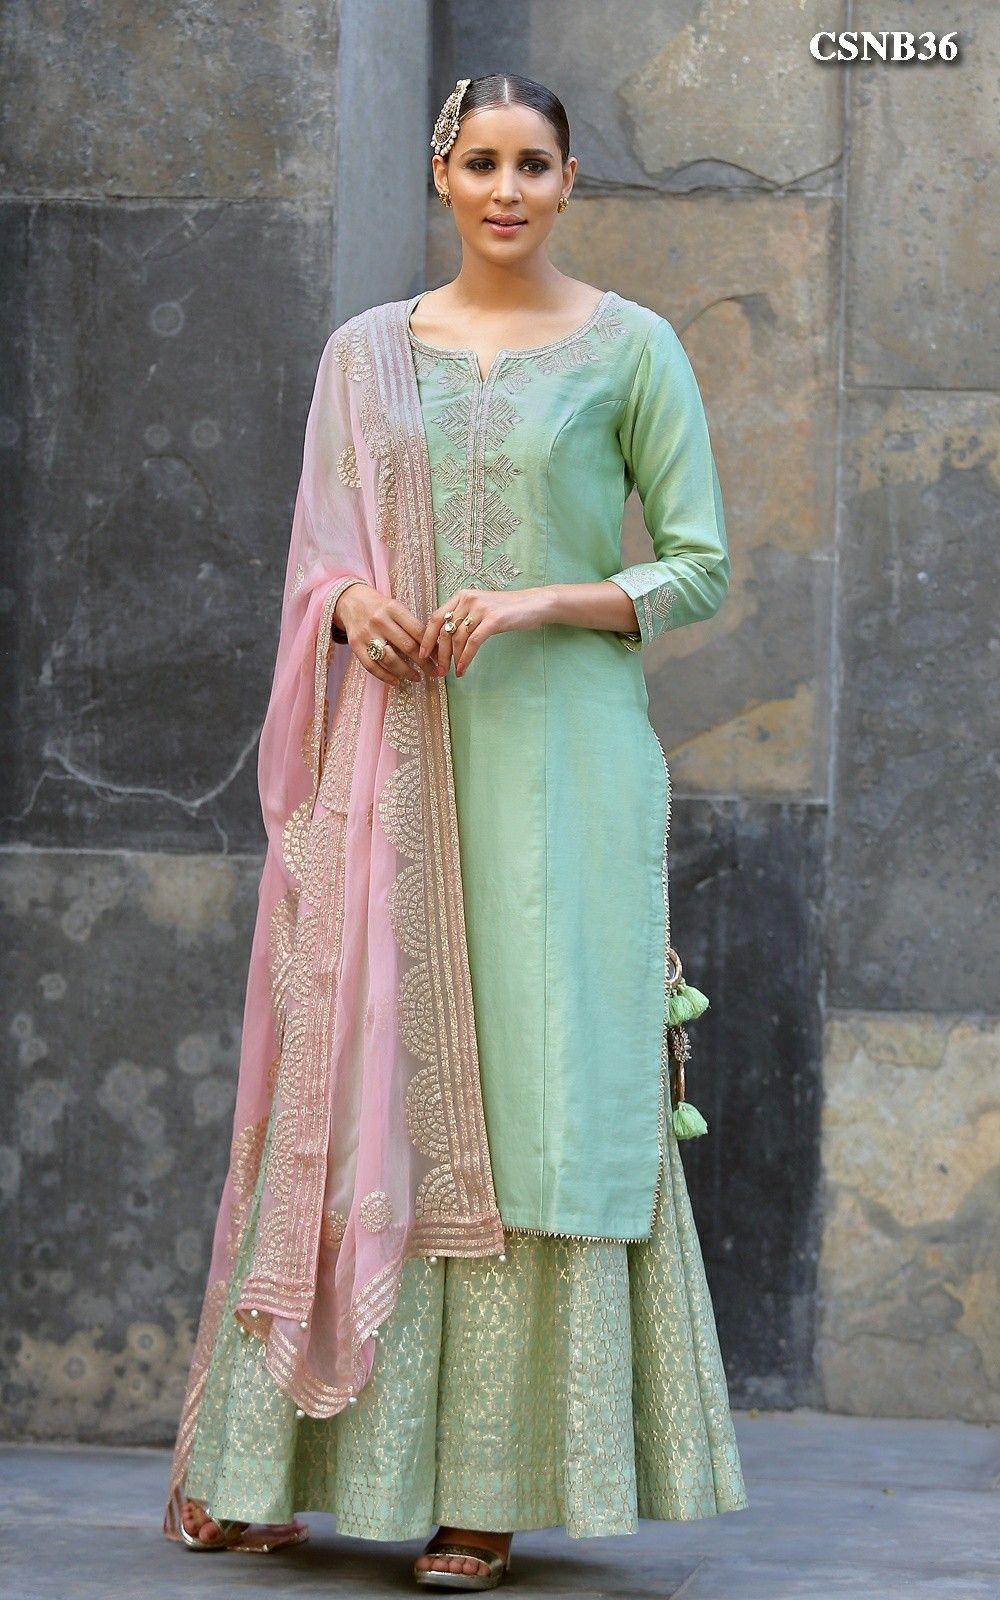 Indian women kurta kurti plazzo sharara dresses suits designer ethnic partywear